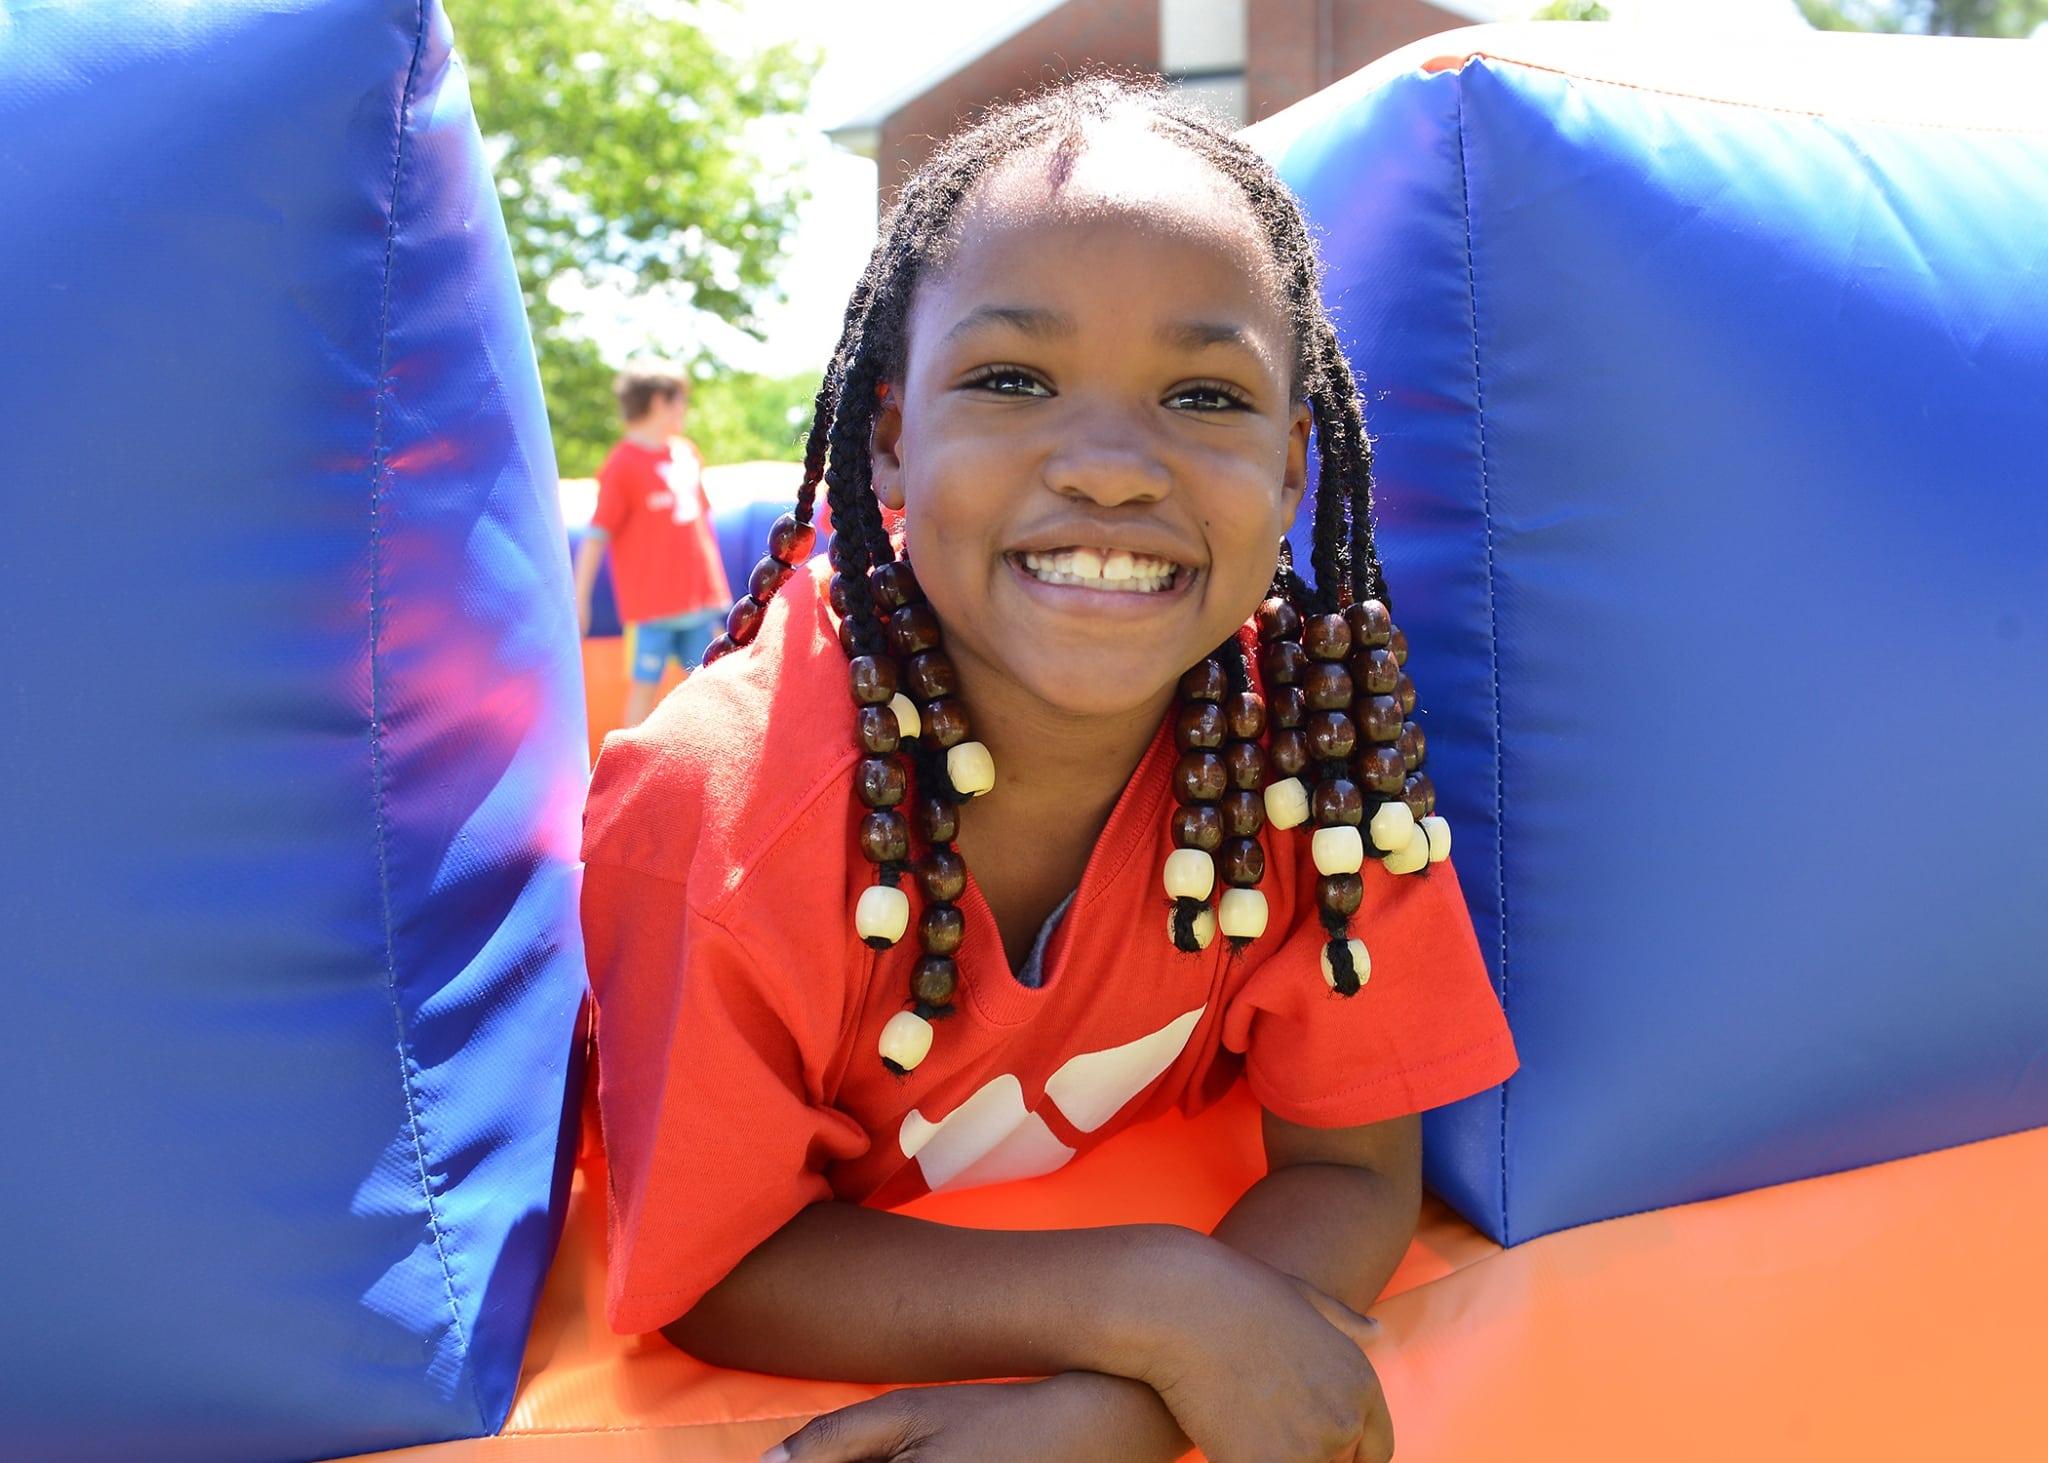 Smiling girl at camp